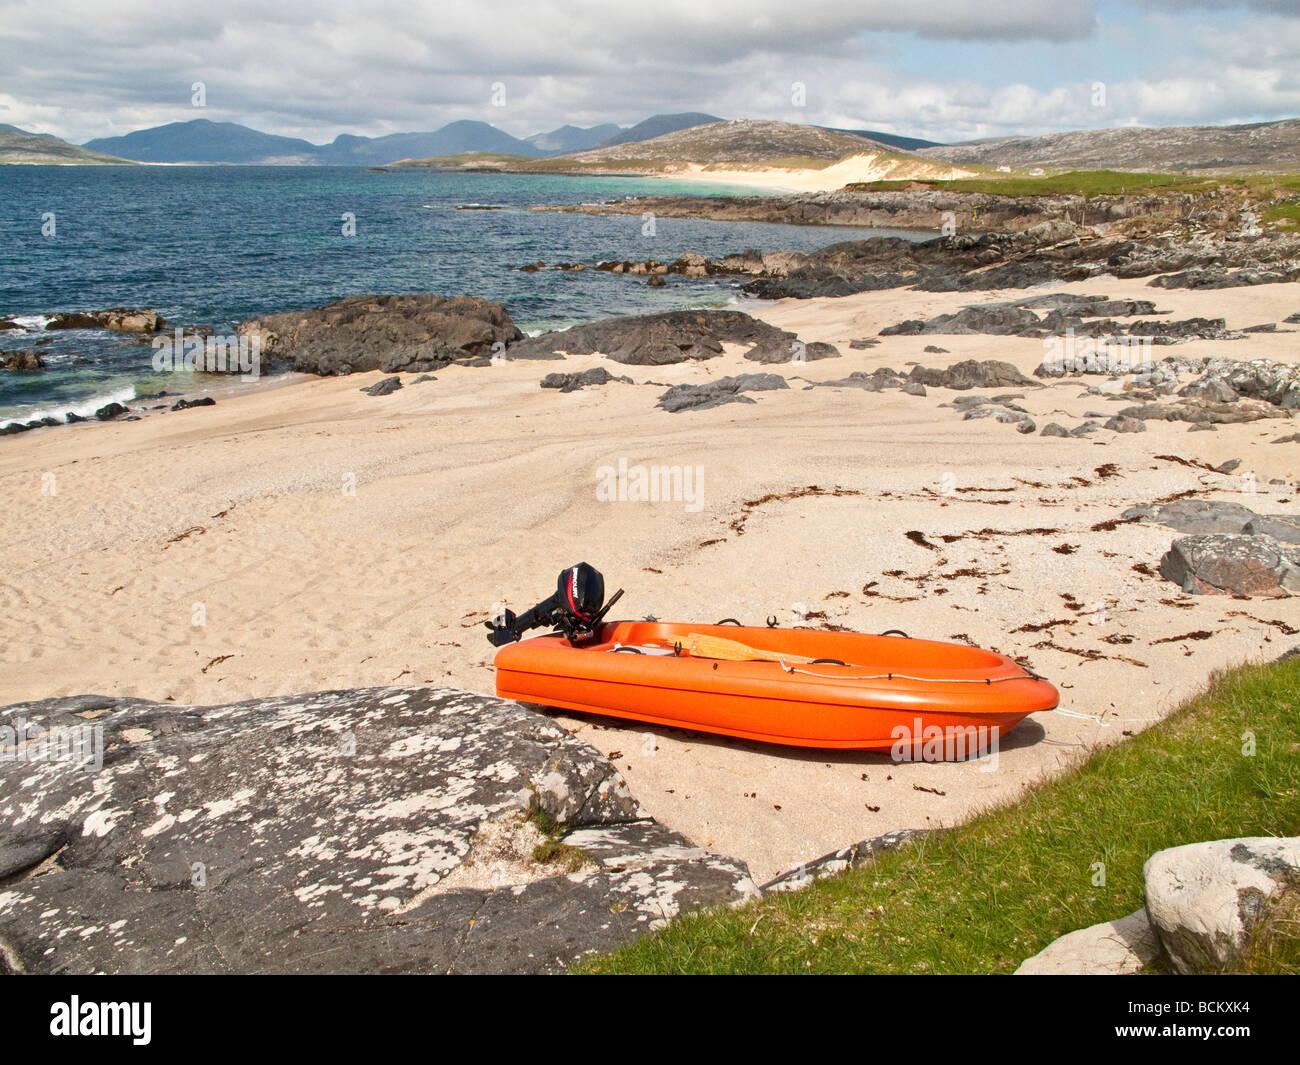 Dinghy on beach at Borve South Harris Scotland UK - Stock Image